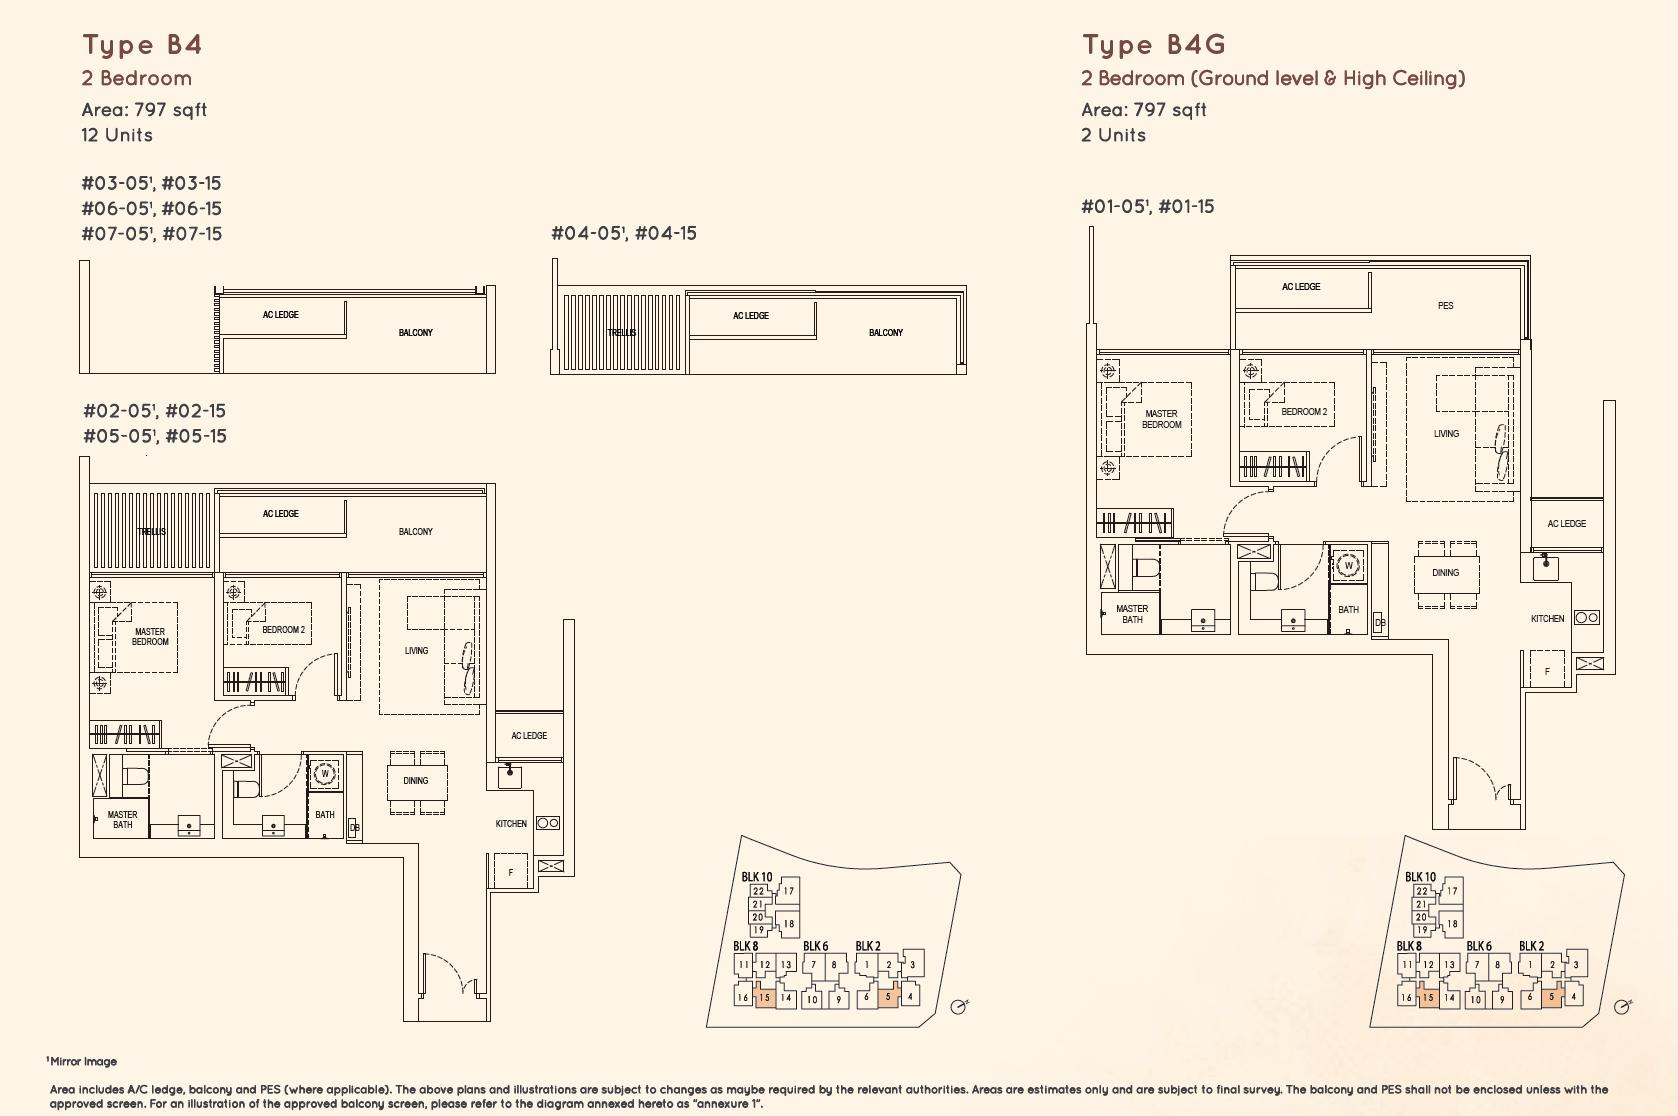 Kandis Residence 2 bedroom floor plan type B4